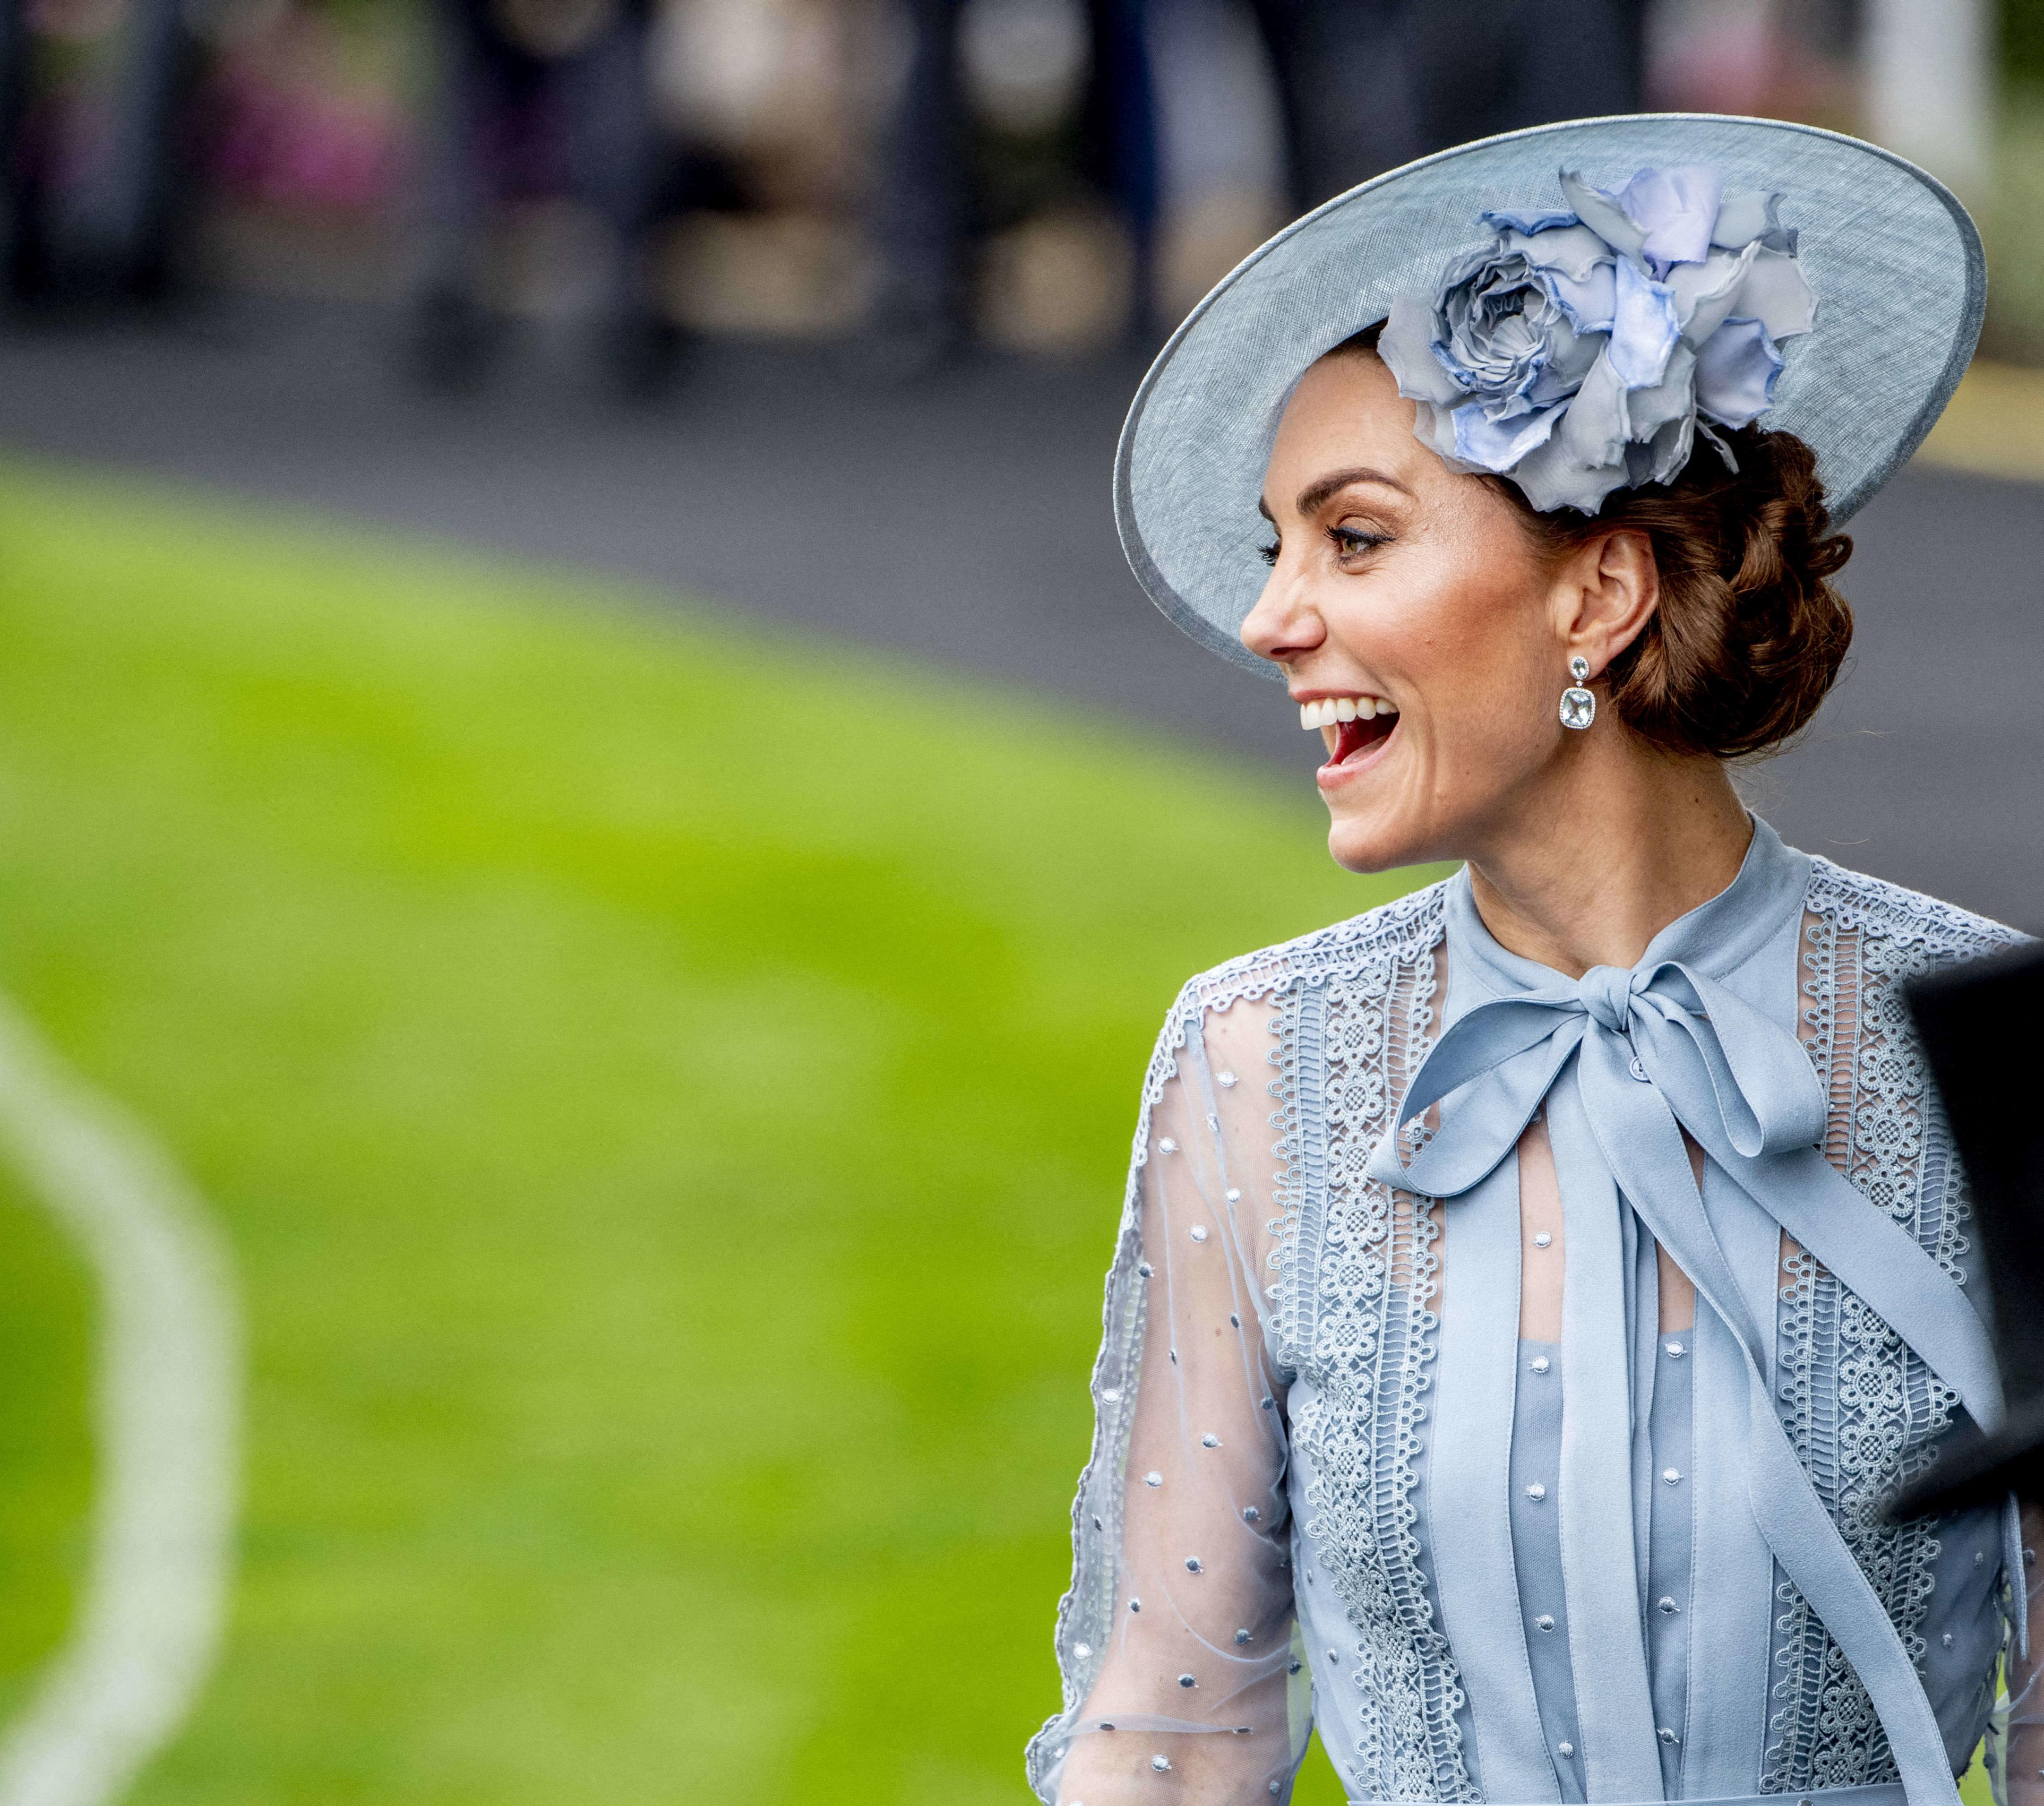 Kate Middleton Wimbledon 2019